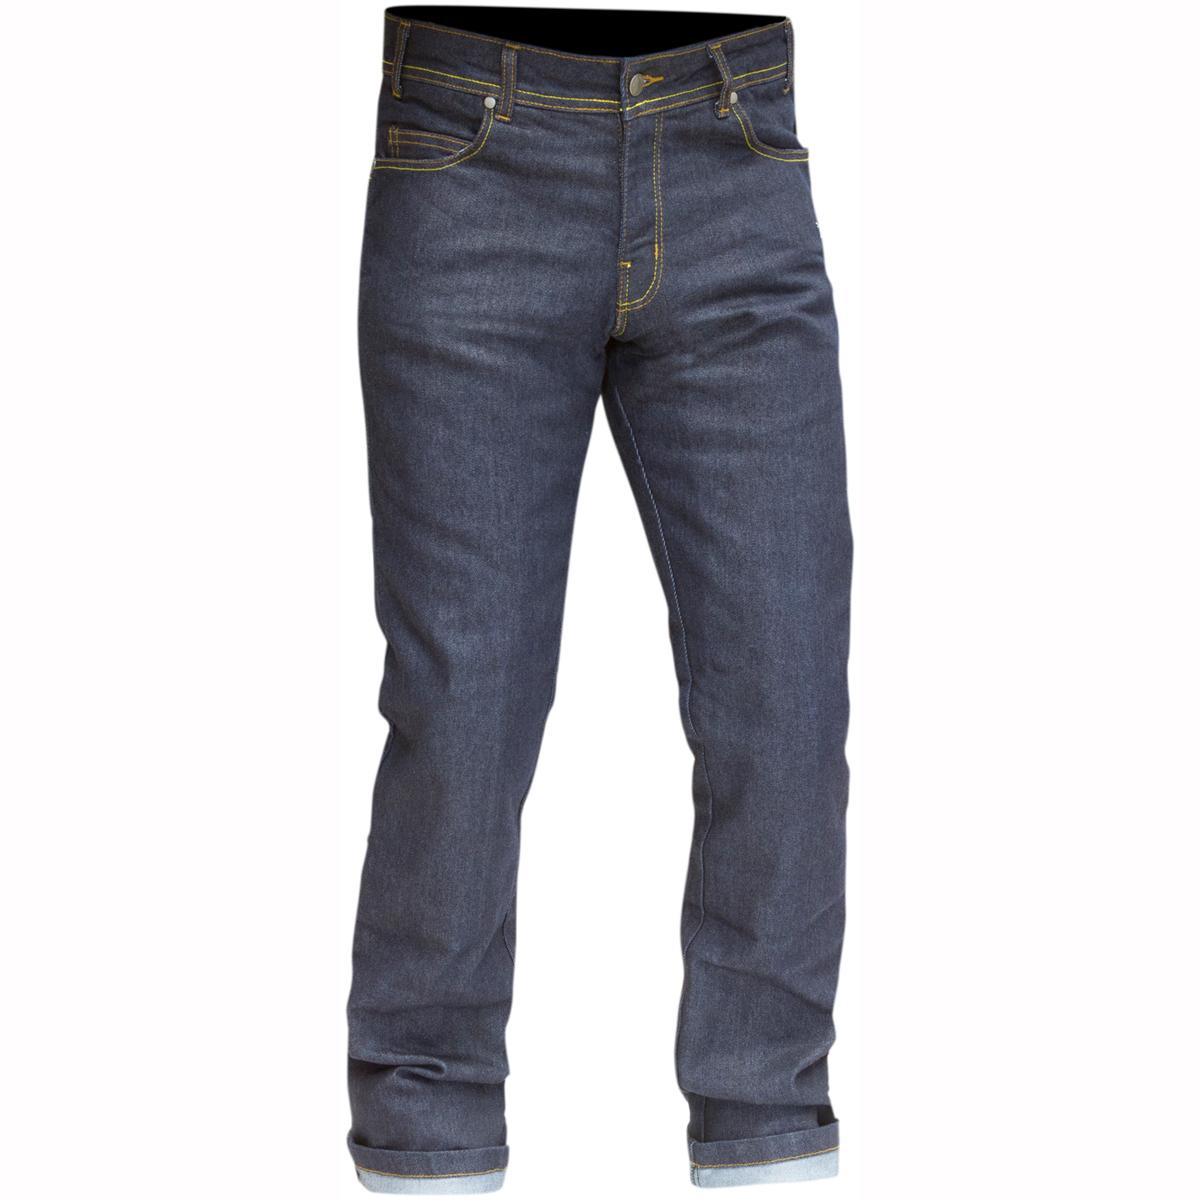 top 10 best motorcycle jeans visordown. Black Bedroom Furniture Sets. Home Design Ideas